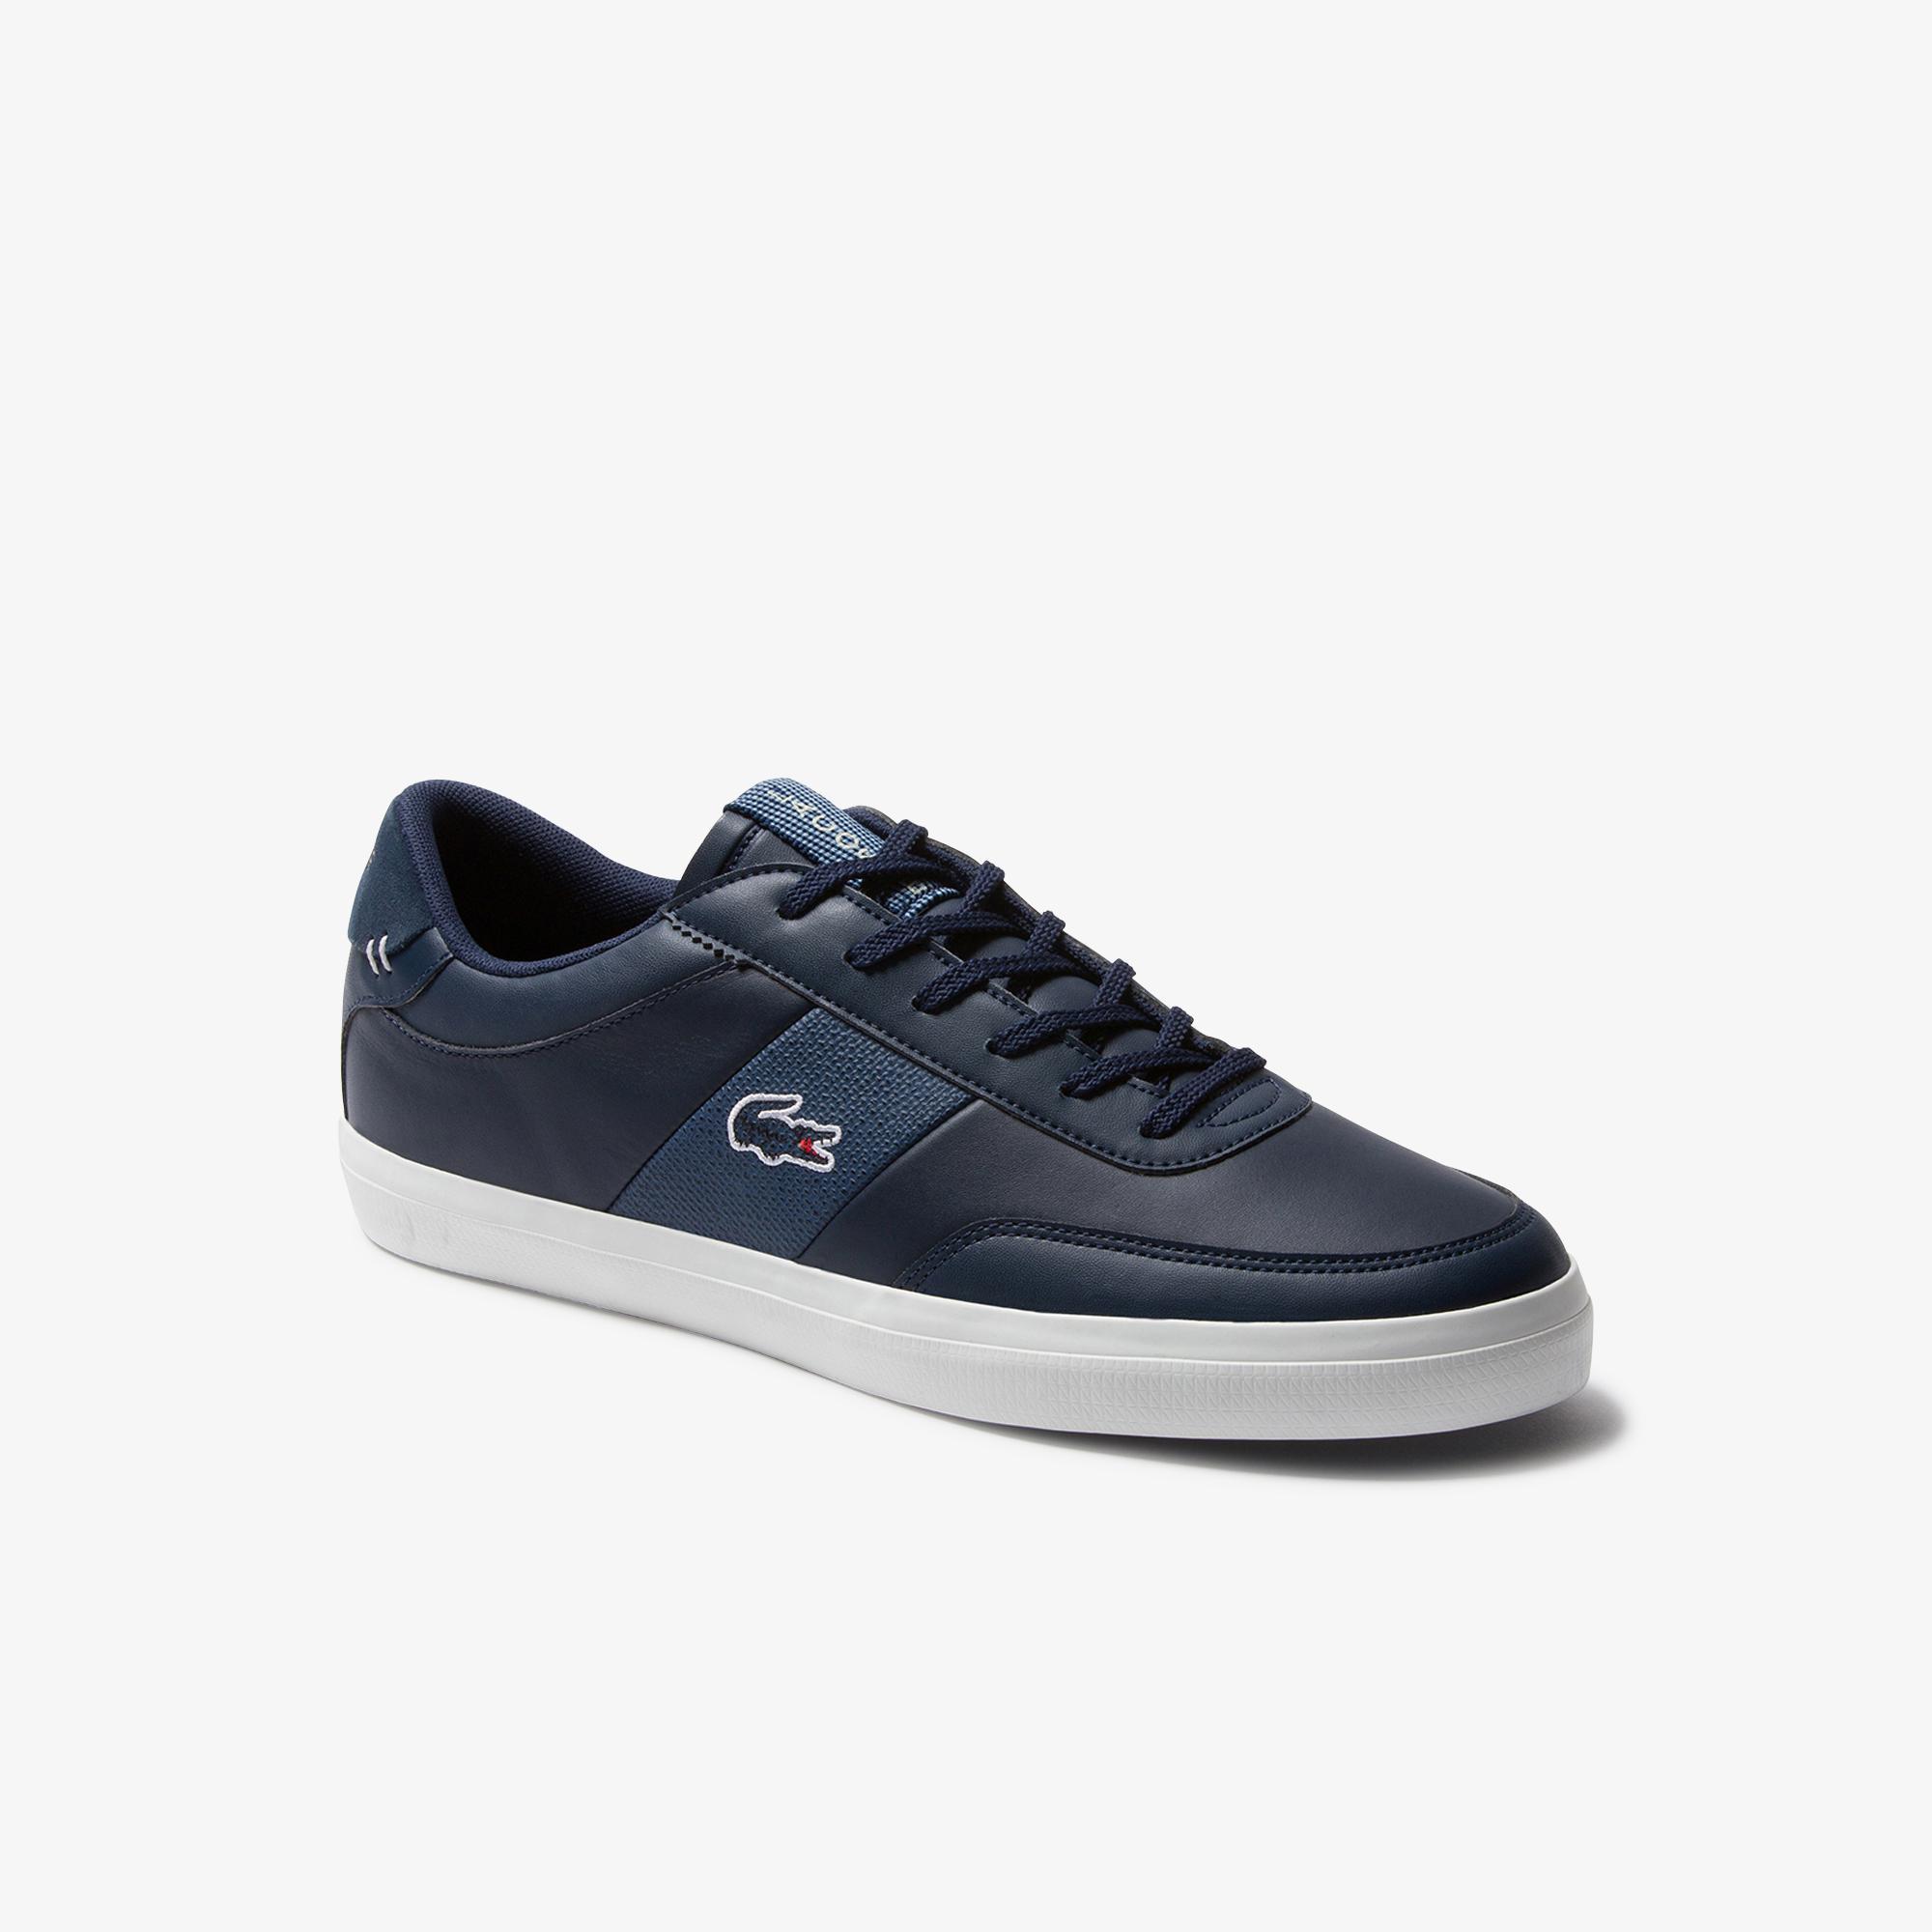 Lacoste Court-Master 120 2 Men's Sneakers